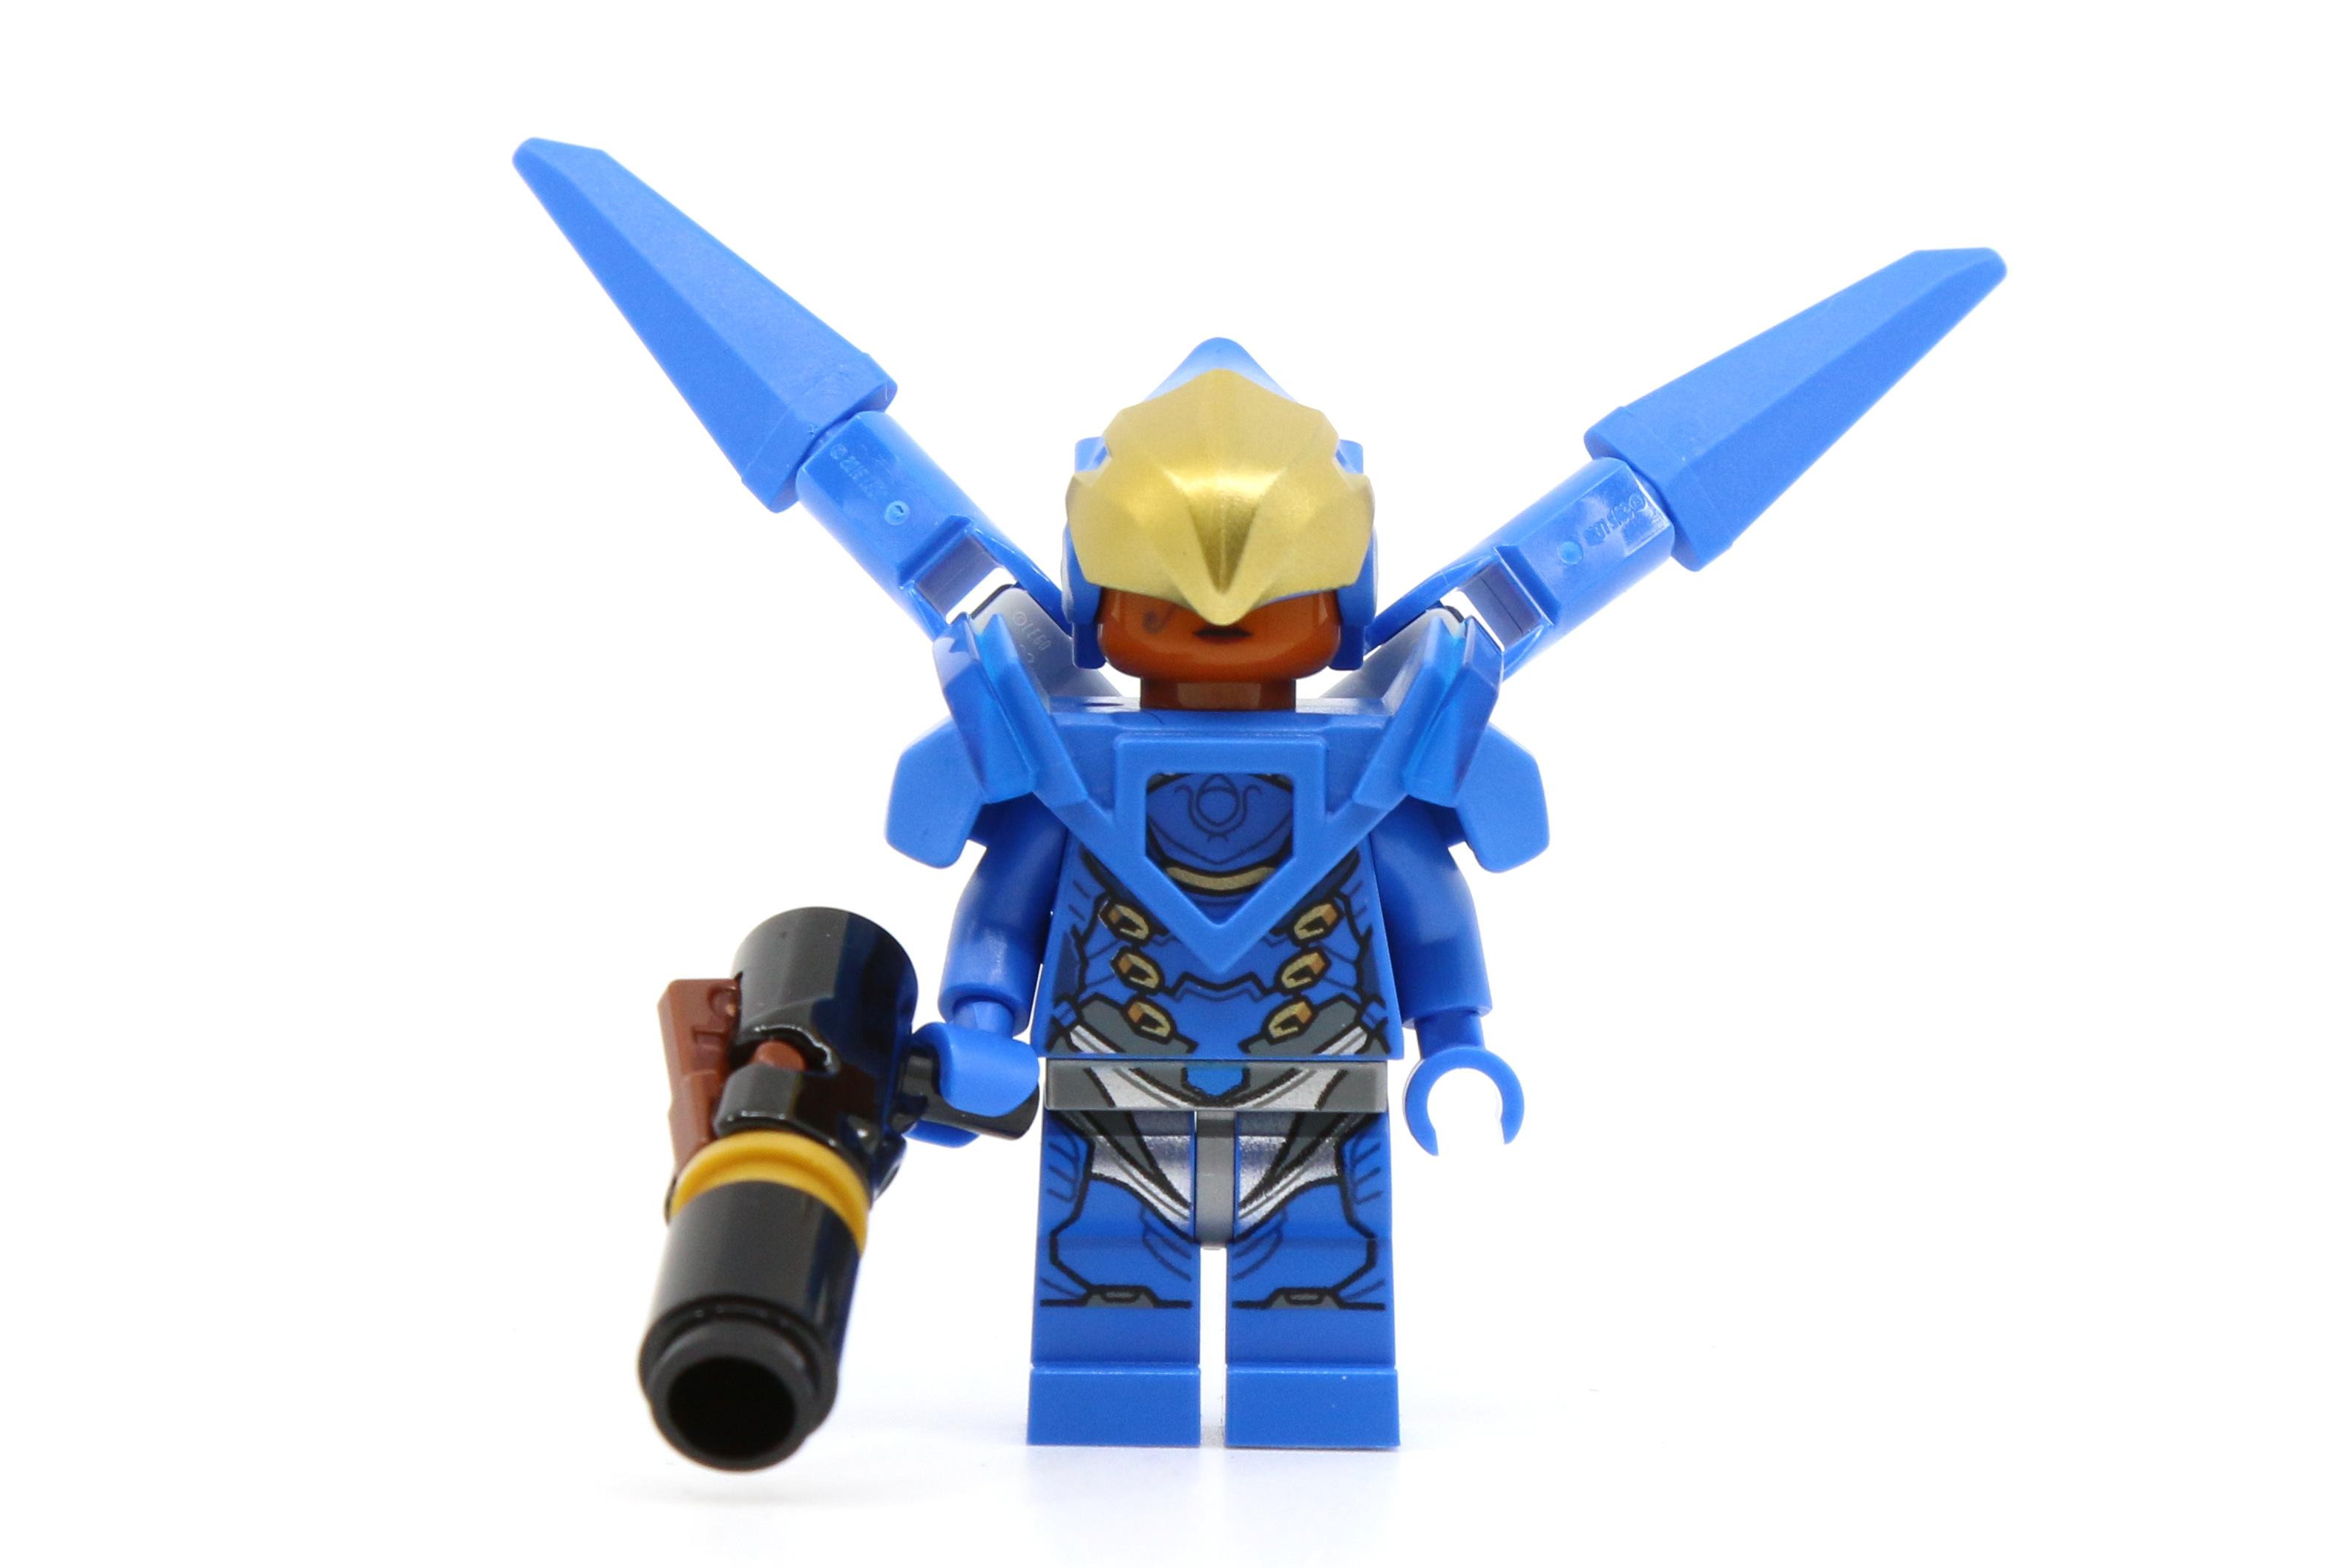 Lego Mini Figure Overwatch Winston from Set 75975 Watchpoint Gibraltar